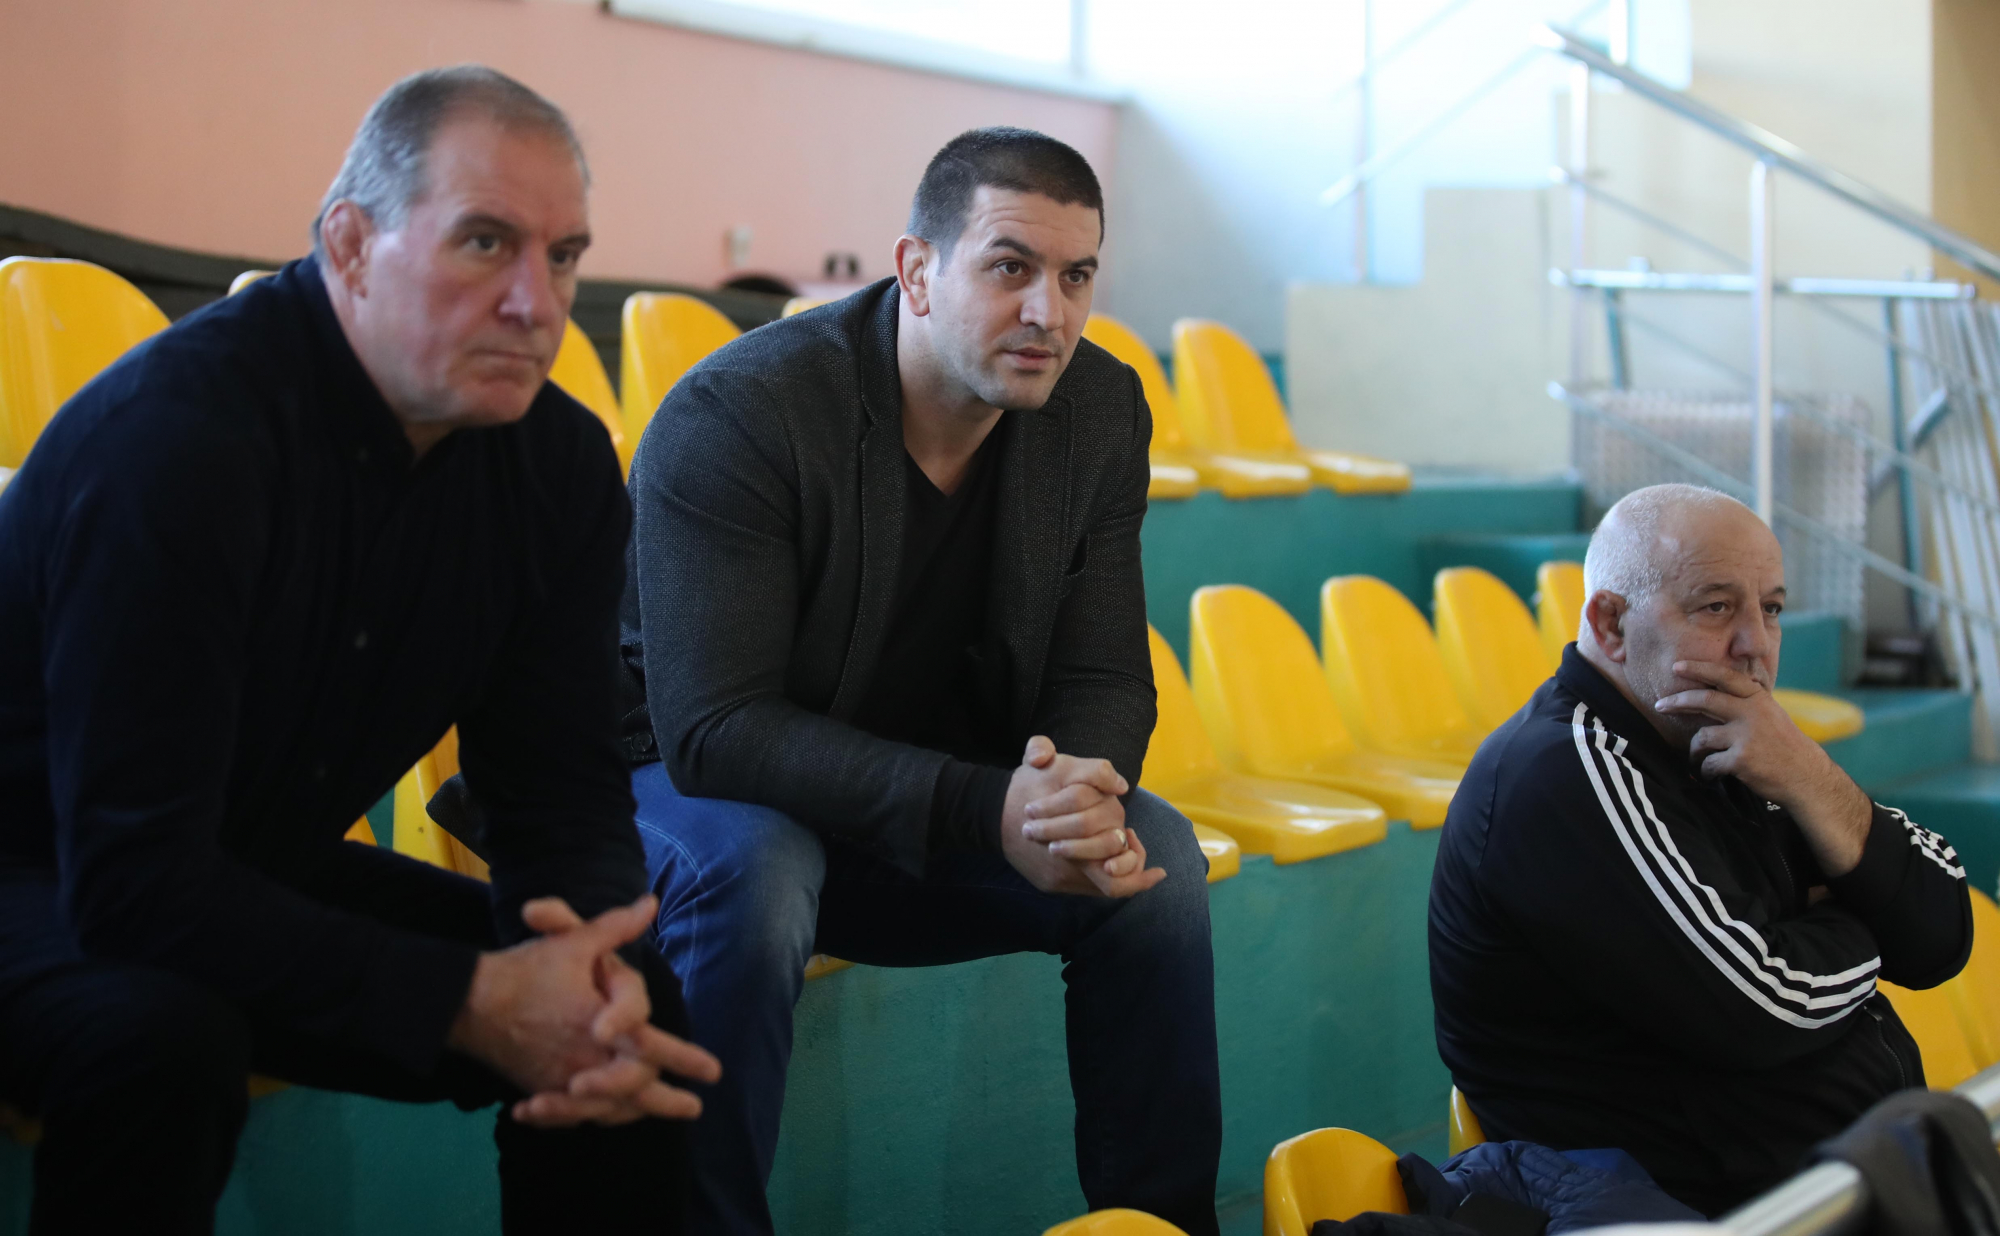 Христо Маринов: Радва ме нивото на младите